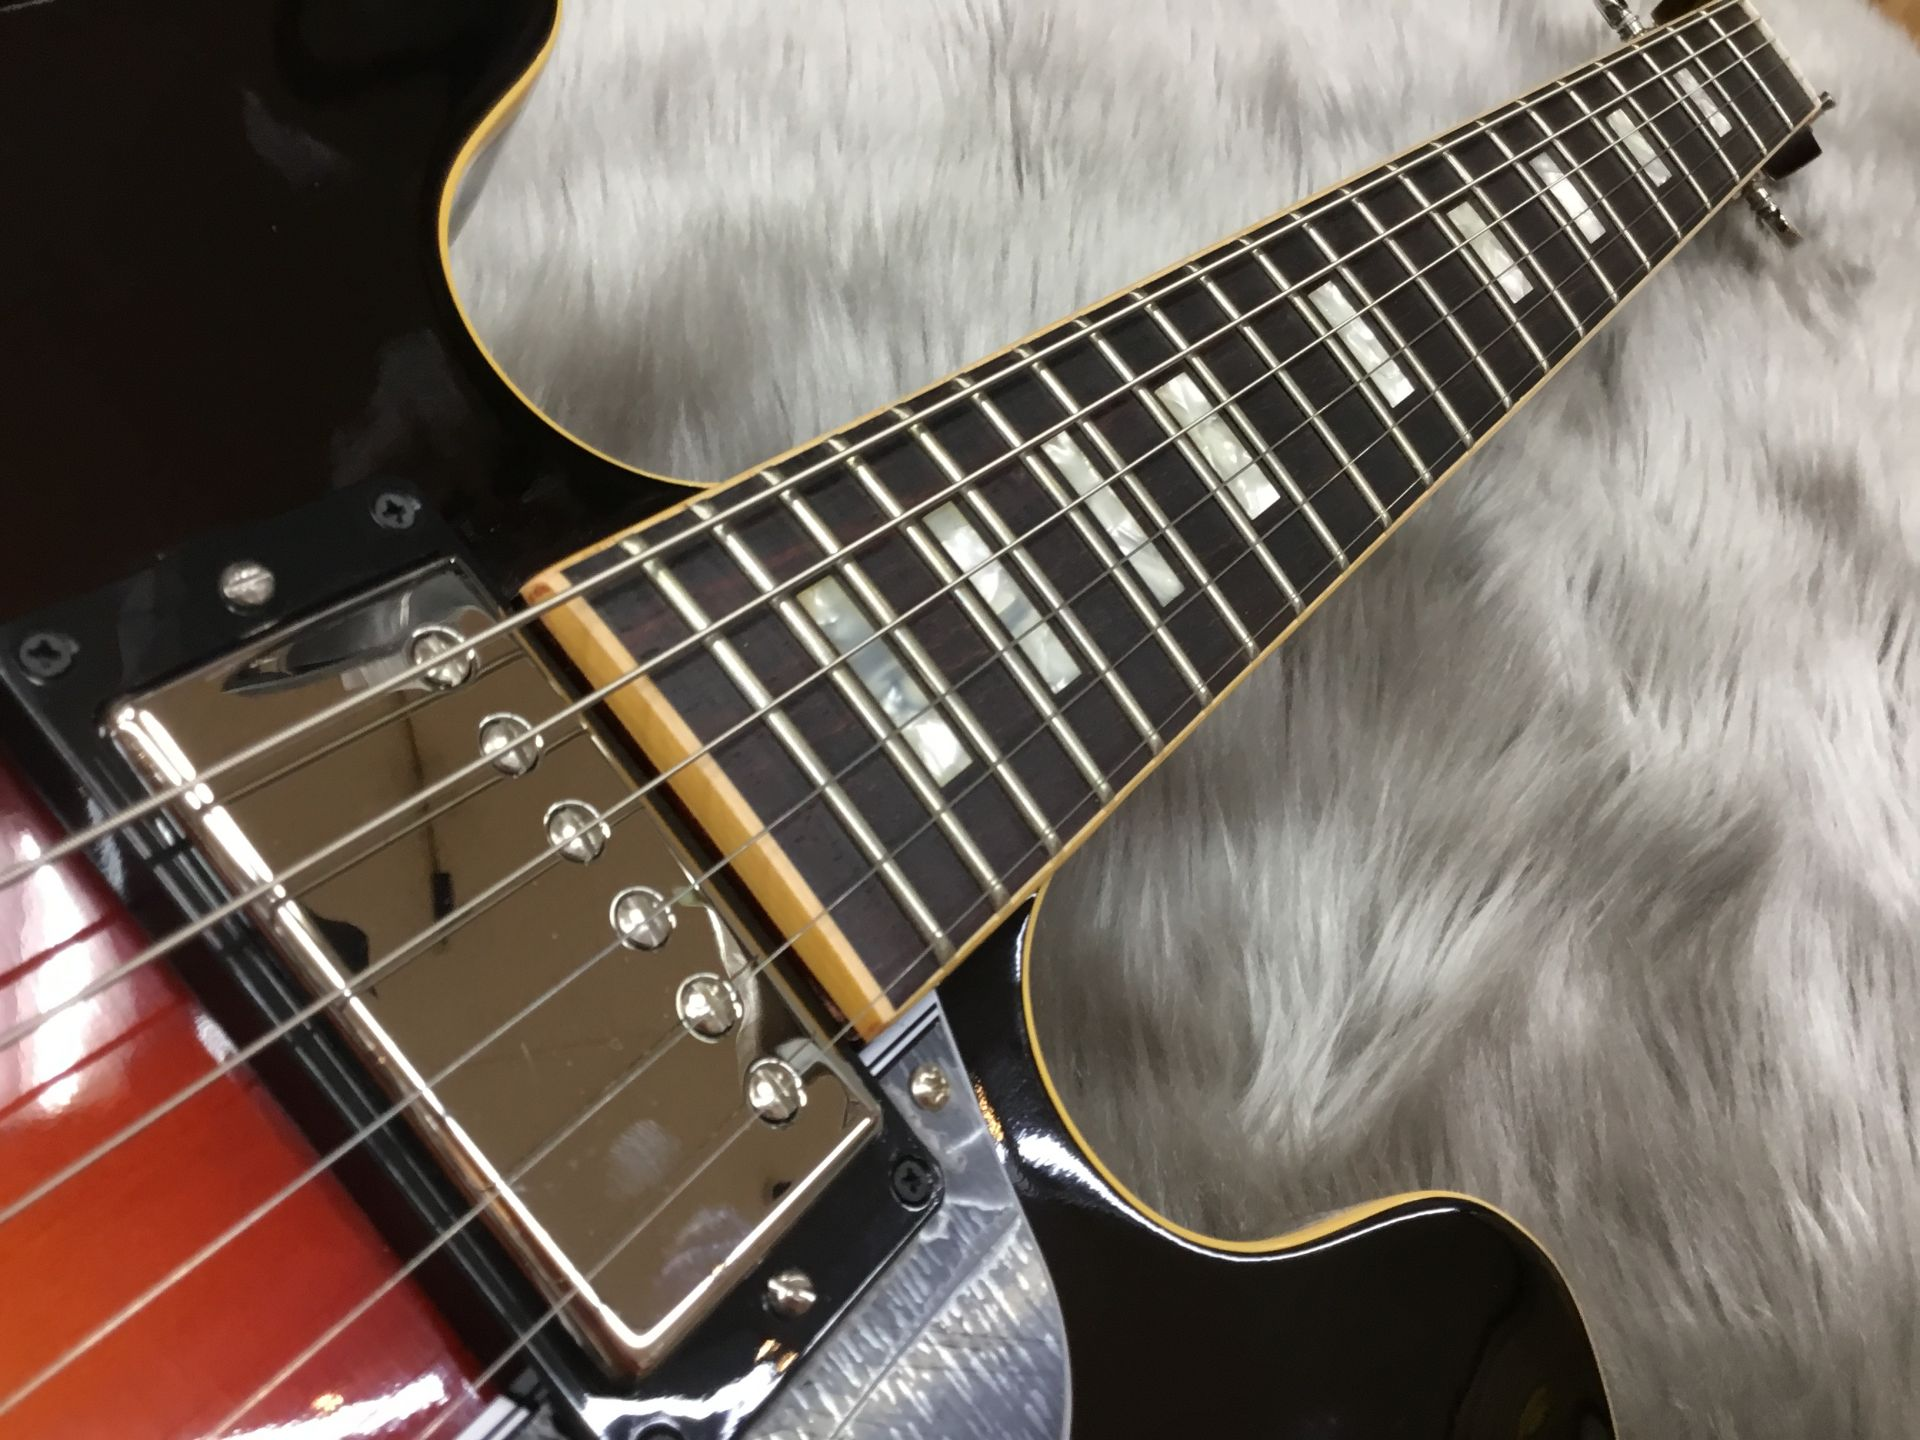 ES-335 TRADITIONALのヘッド裏-アップ画像